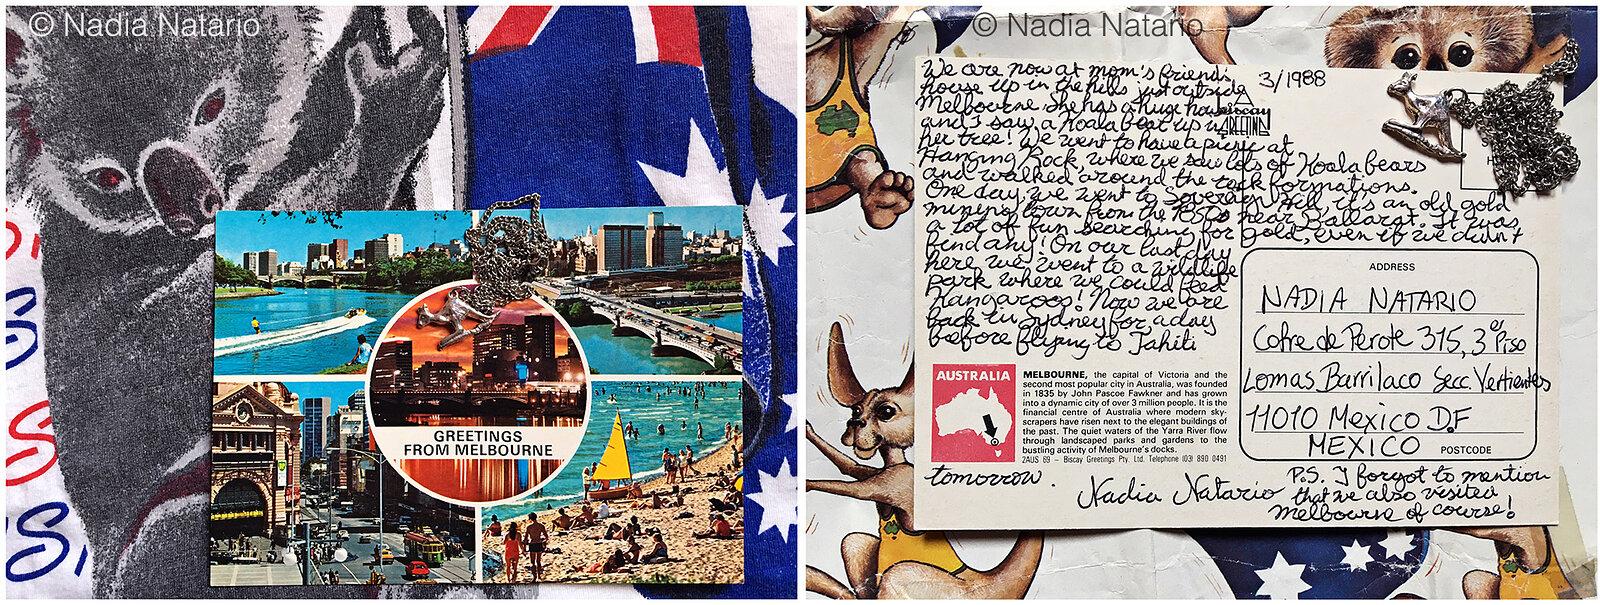 Postcards to Myself - Melbourne, Australia, 1988